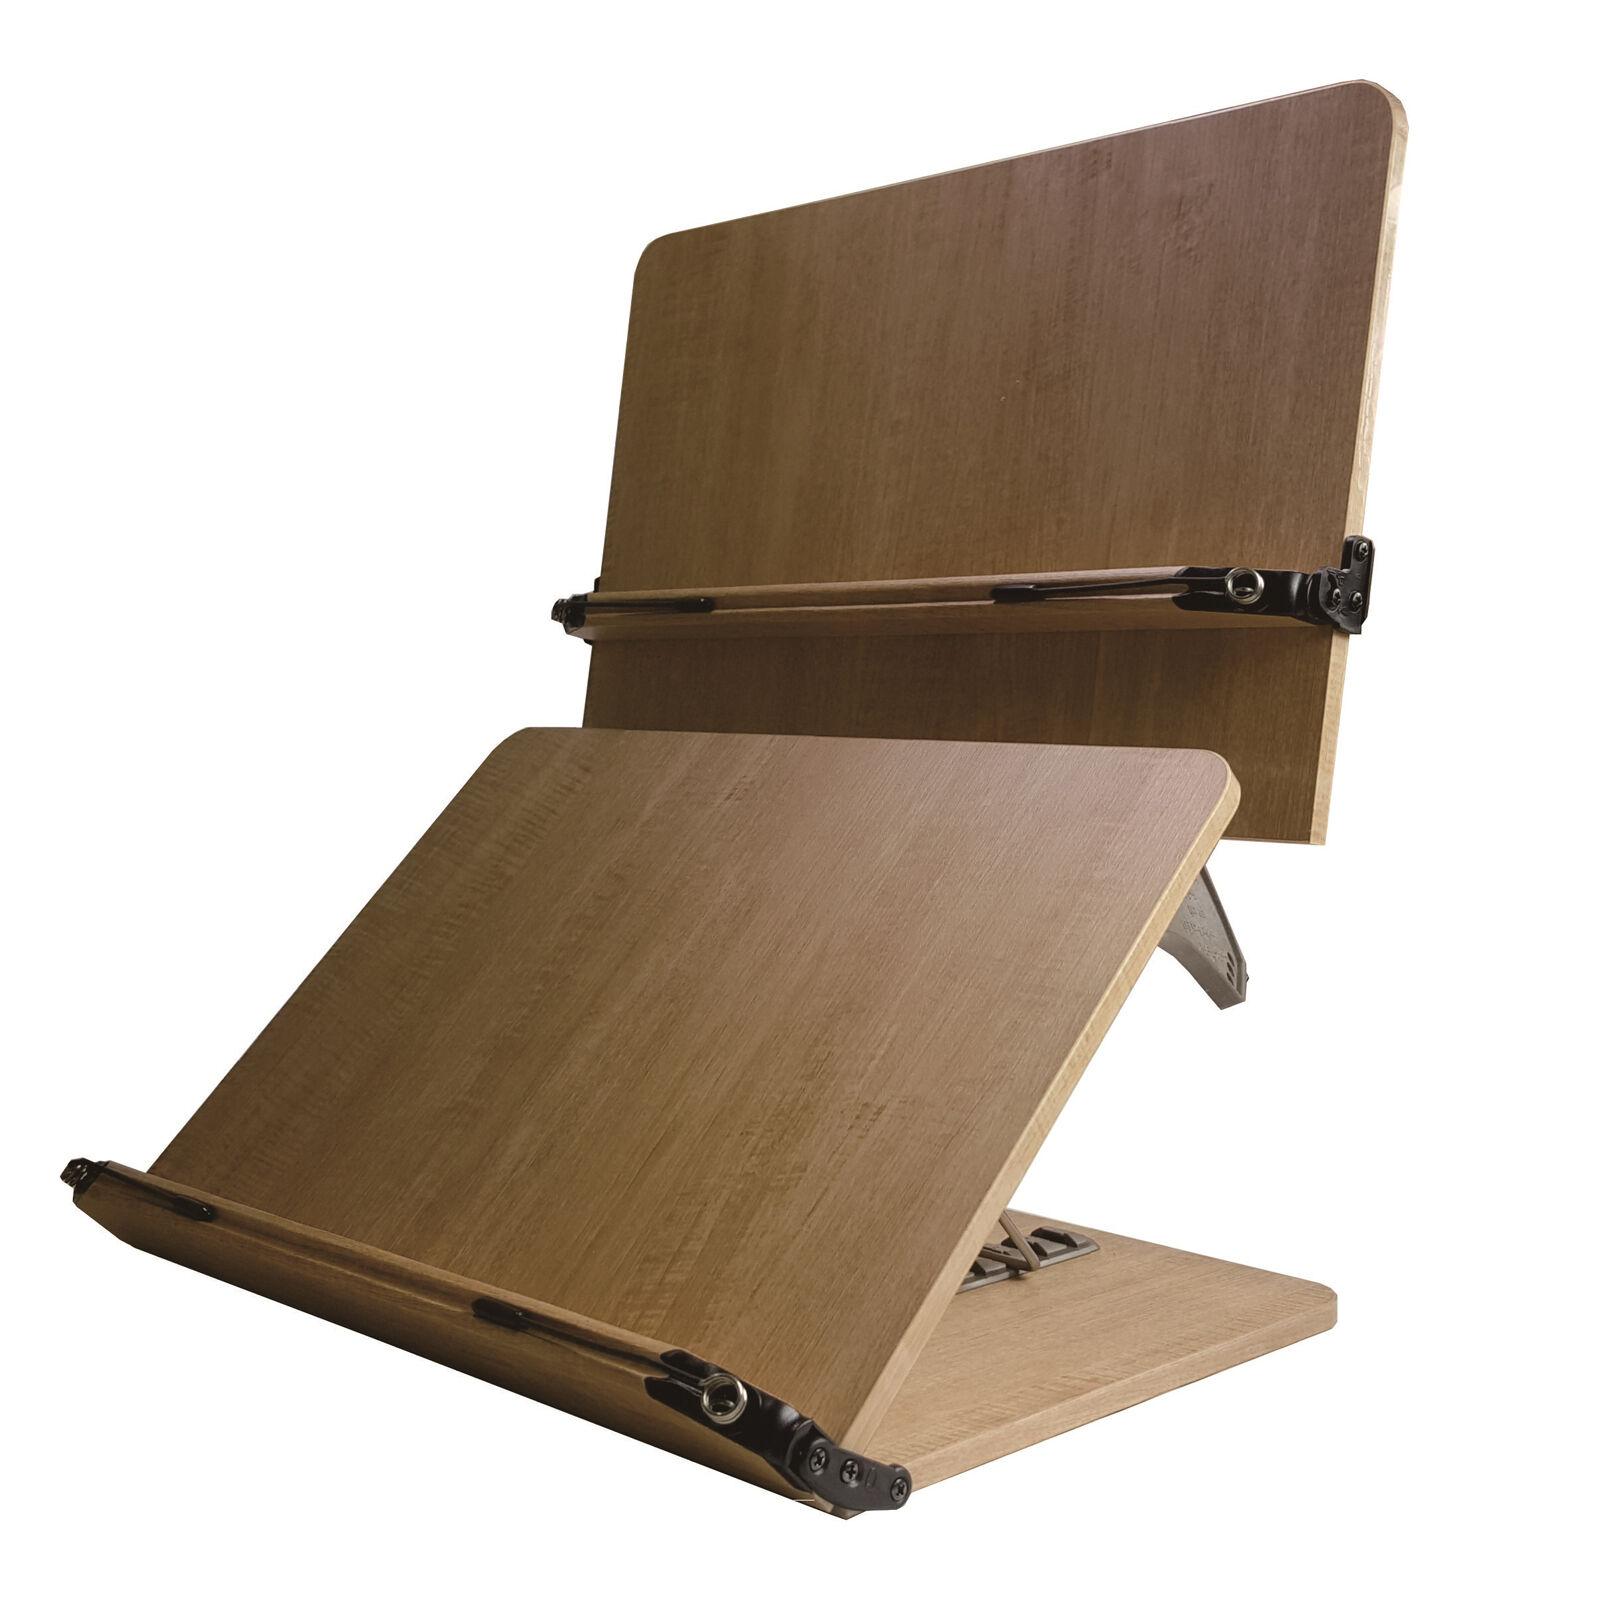 202d Nice Book Stand Portable Wooden Reading Holder Desk Bookstands